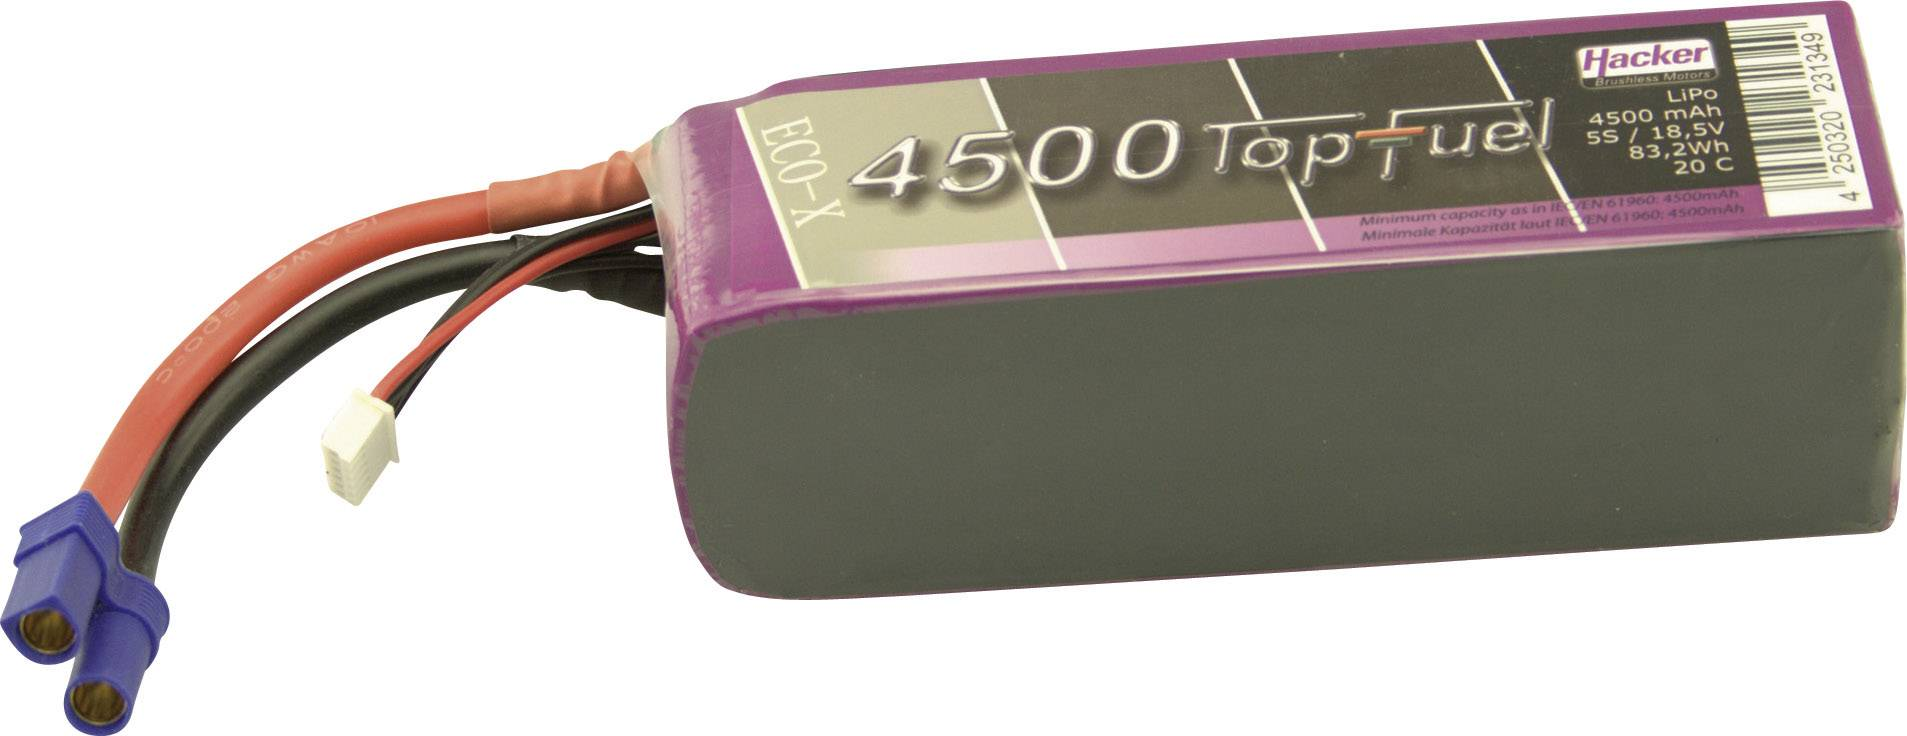 Akupack Li-Pol Hacker 34500531, 18.5 V, 4500 mAh